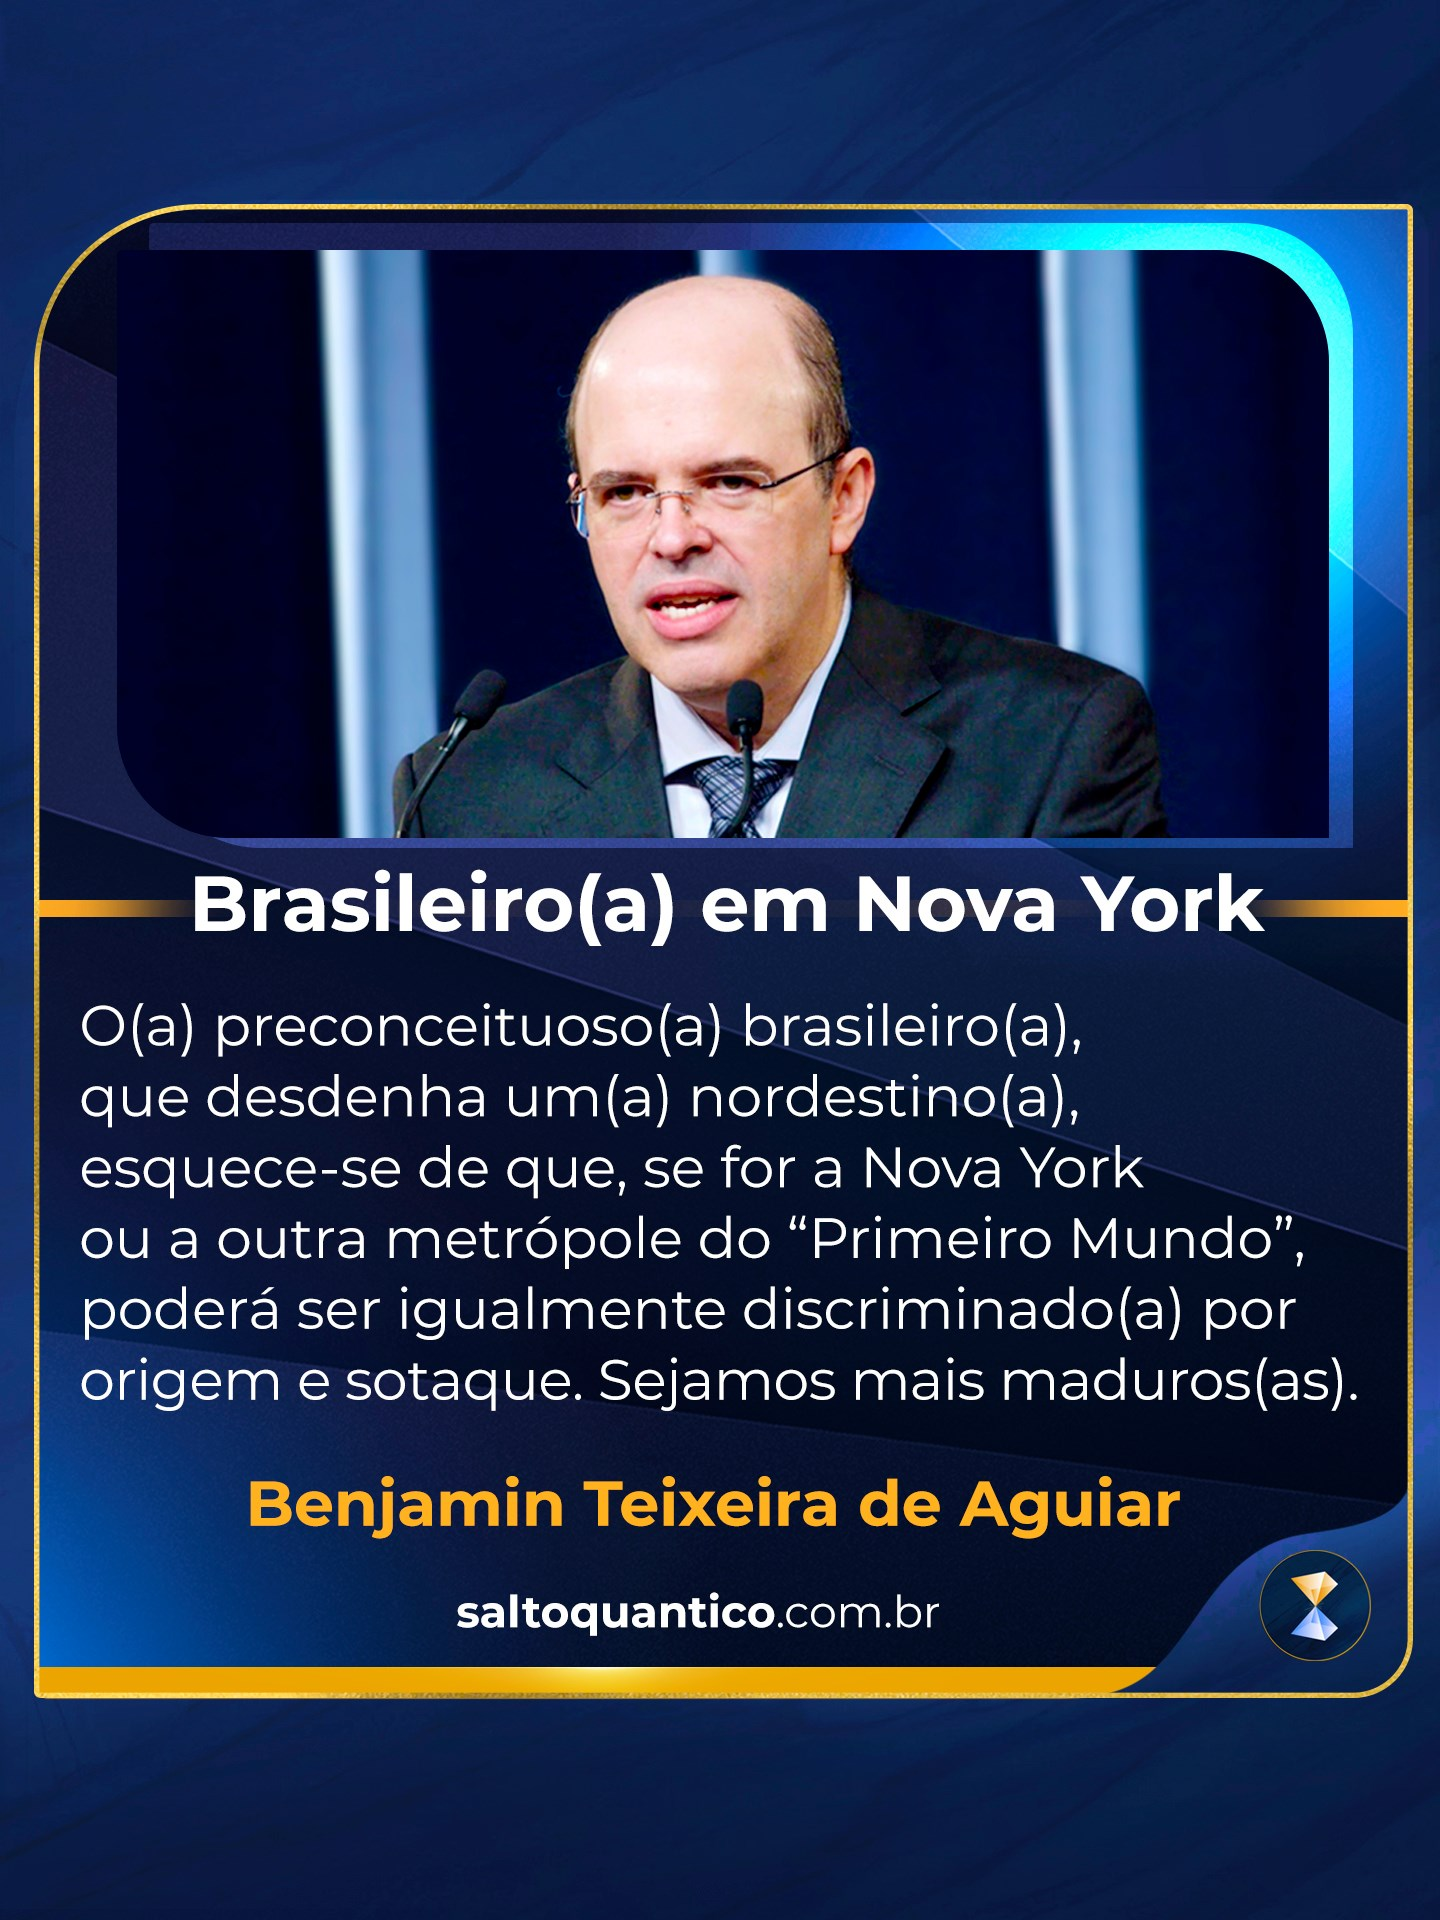 Brasileiro em Nova York